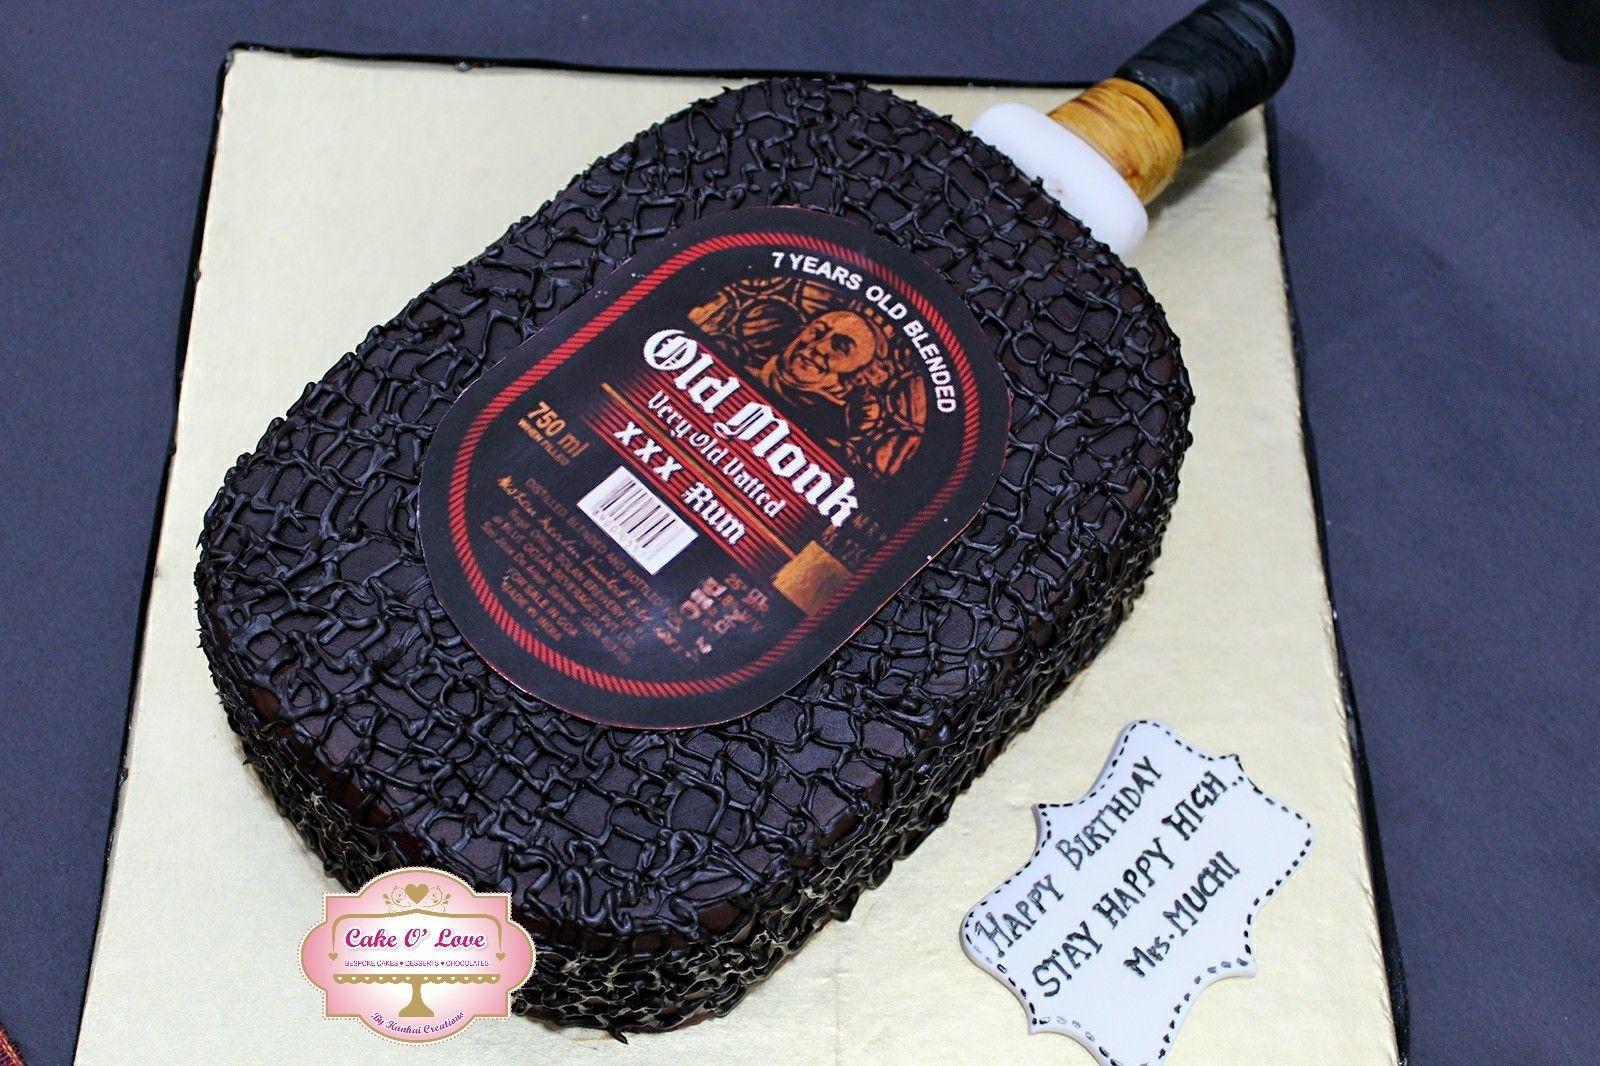 Old Monk Bottle Cake